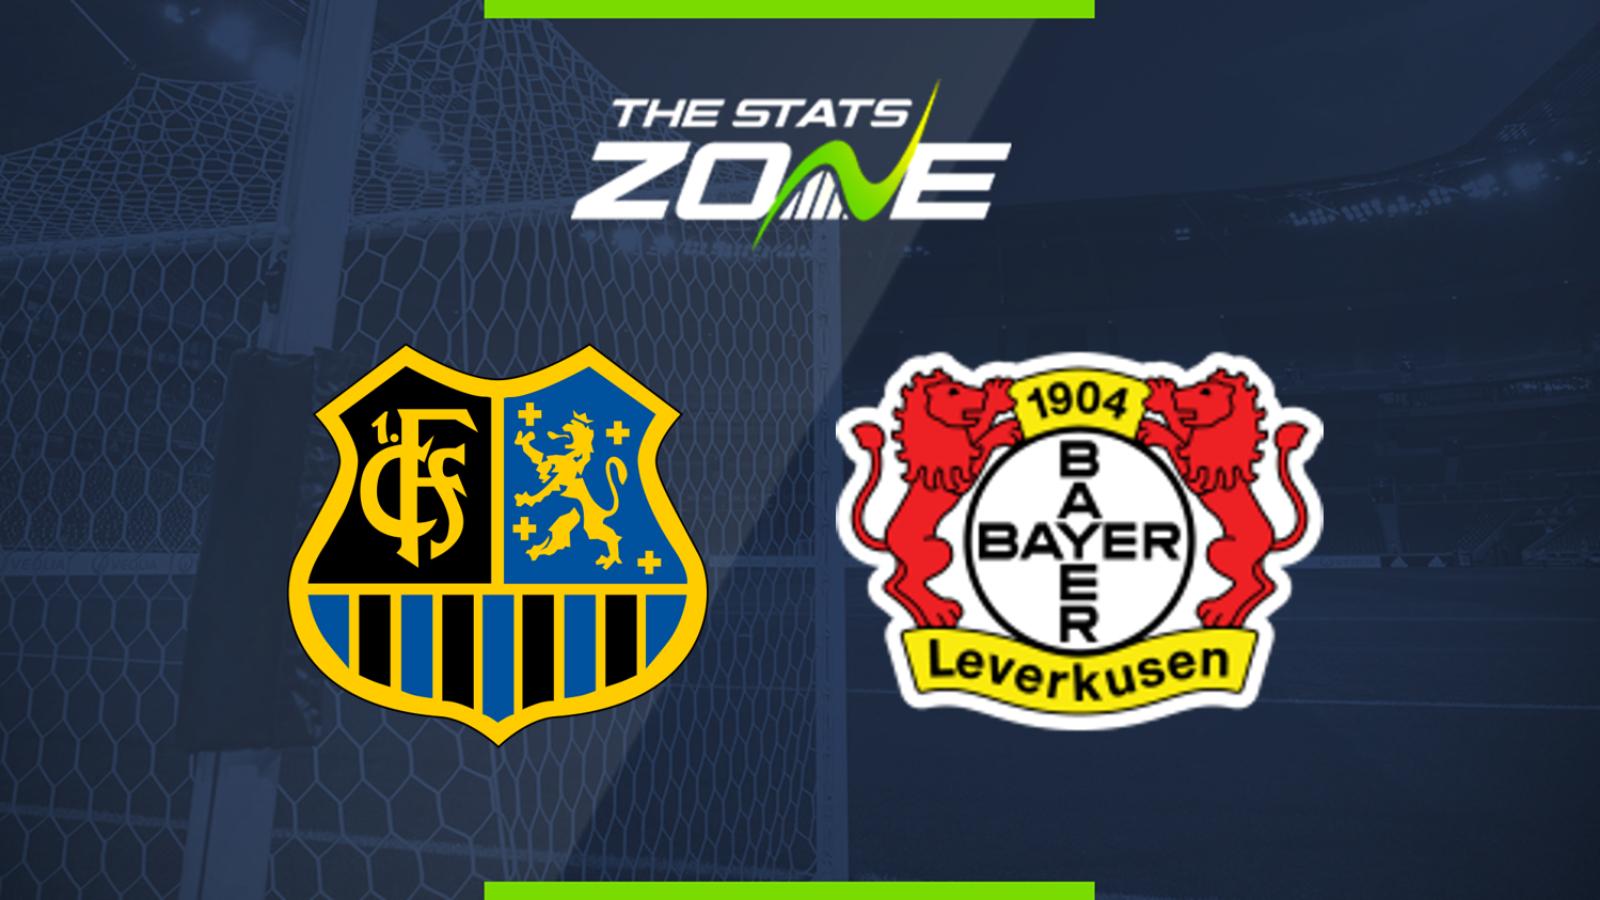 2019 20 German Dfb Pokal Saarbrucken Vs Bayer Leverkusen Preview Prediction The Stats Zone